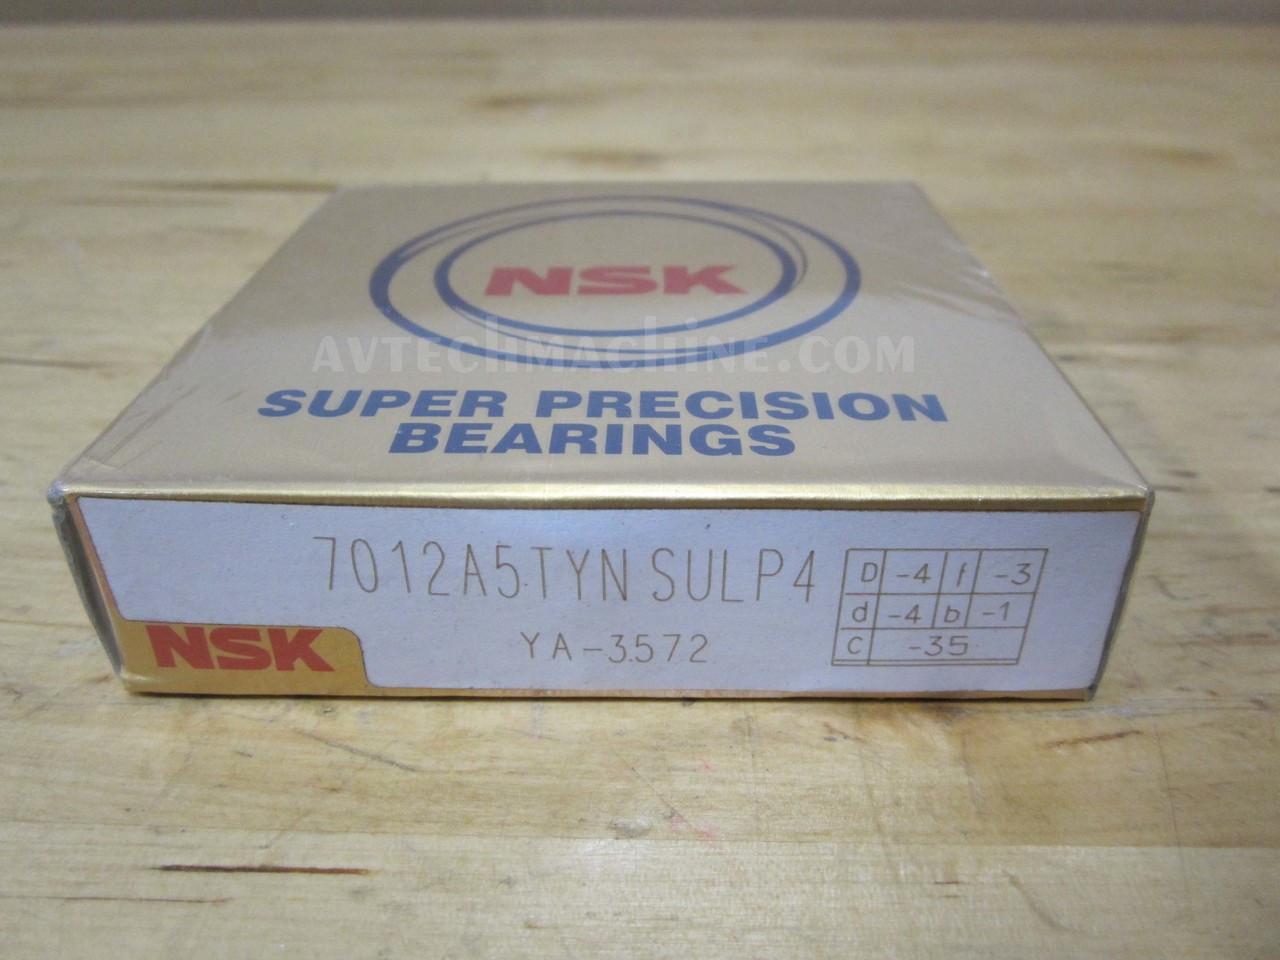 NSK Super Precision Bearing 7008A5TYNSULP4